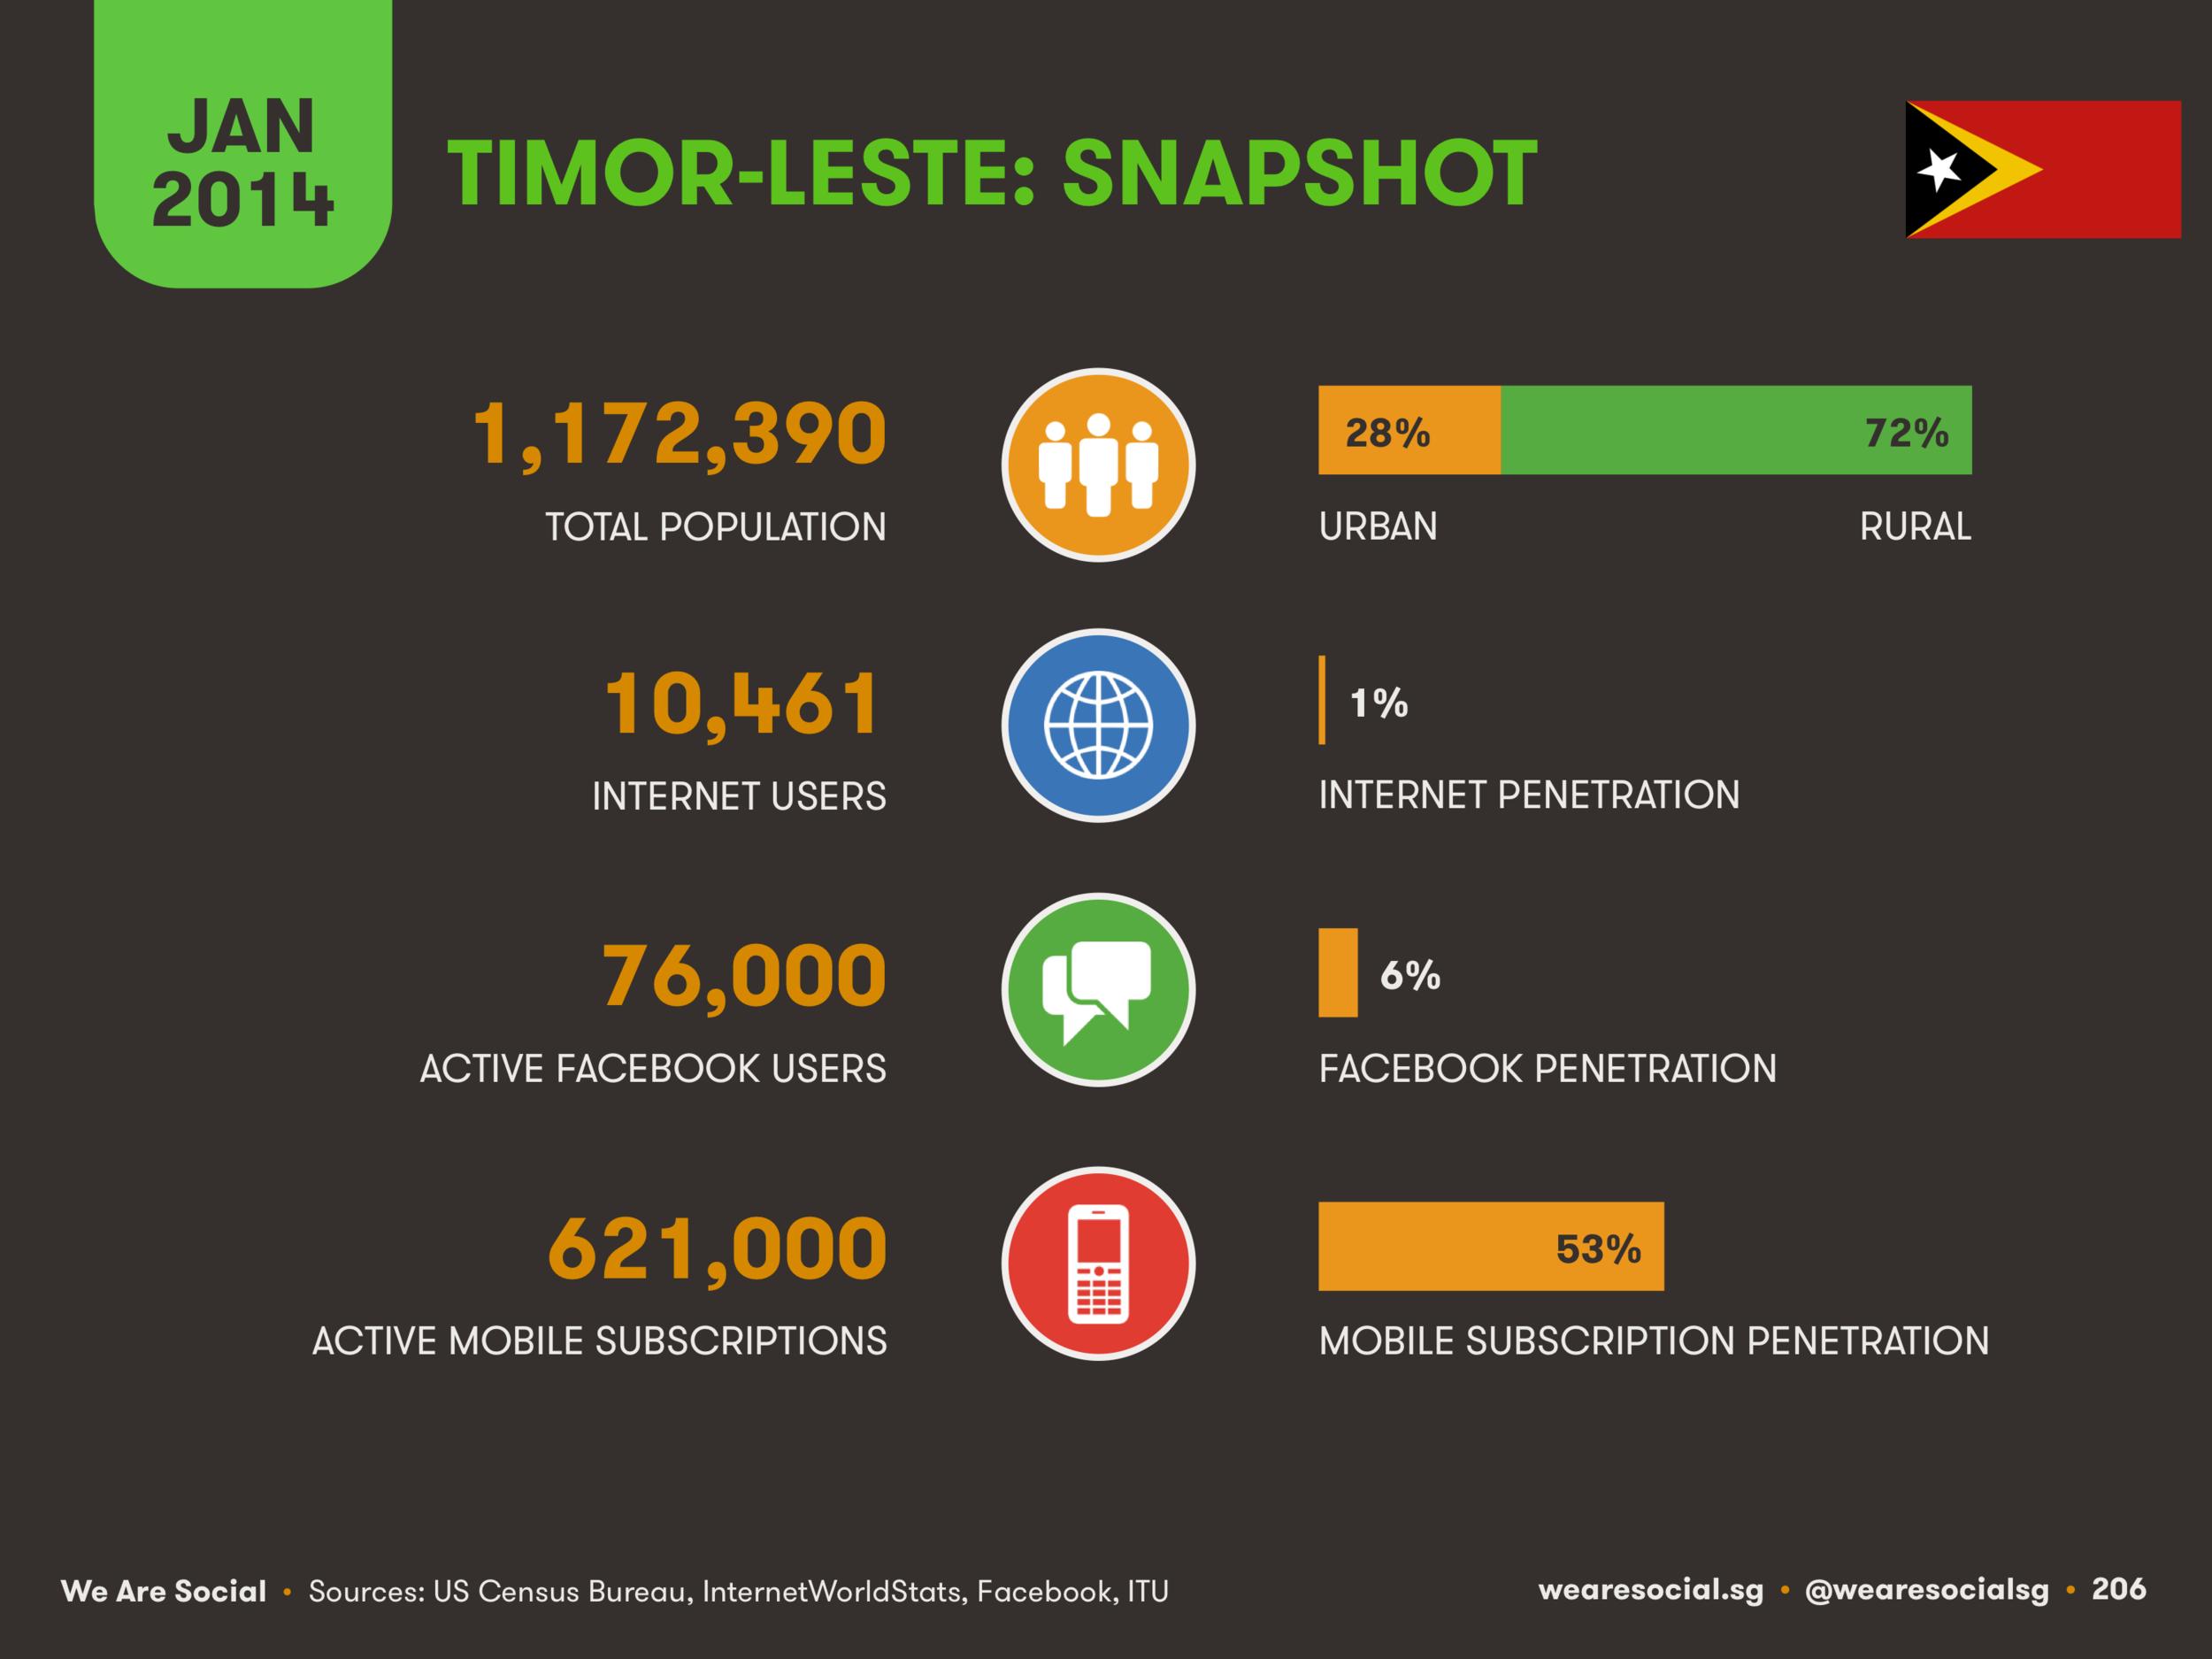 Digital in Timor-Leste January 2014 DataReportal